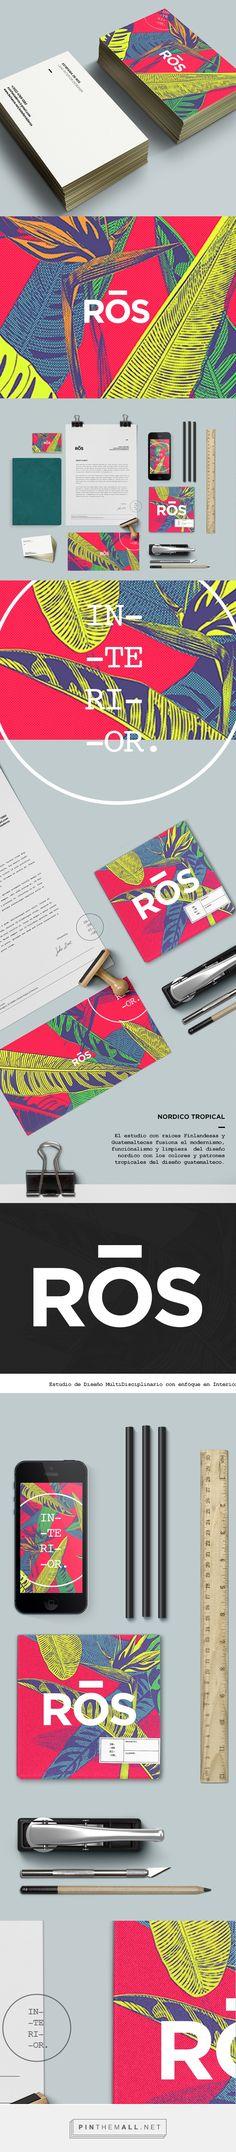 Ros Interior Design Branding on Behance   Fivestar Branding – Design and Branding Agency & Inspiration Gallery